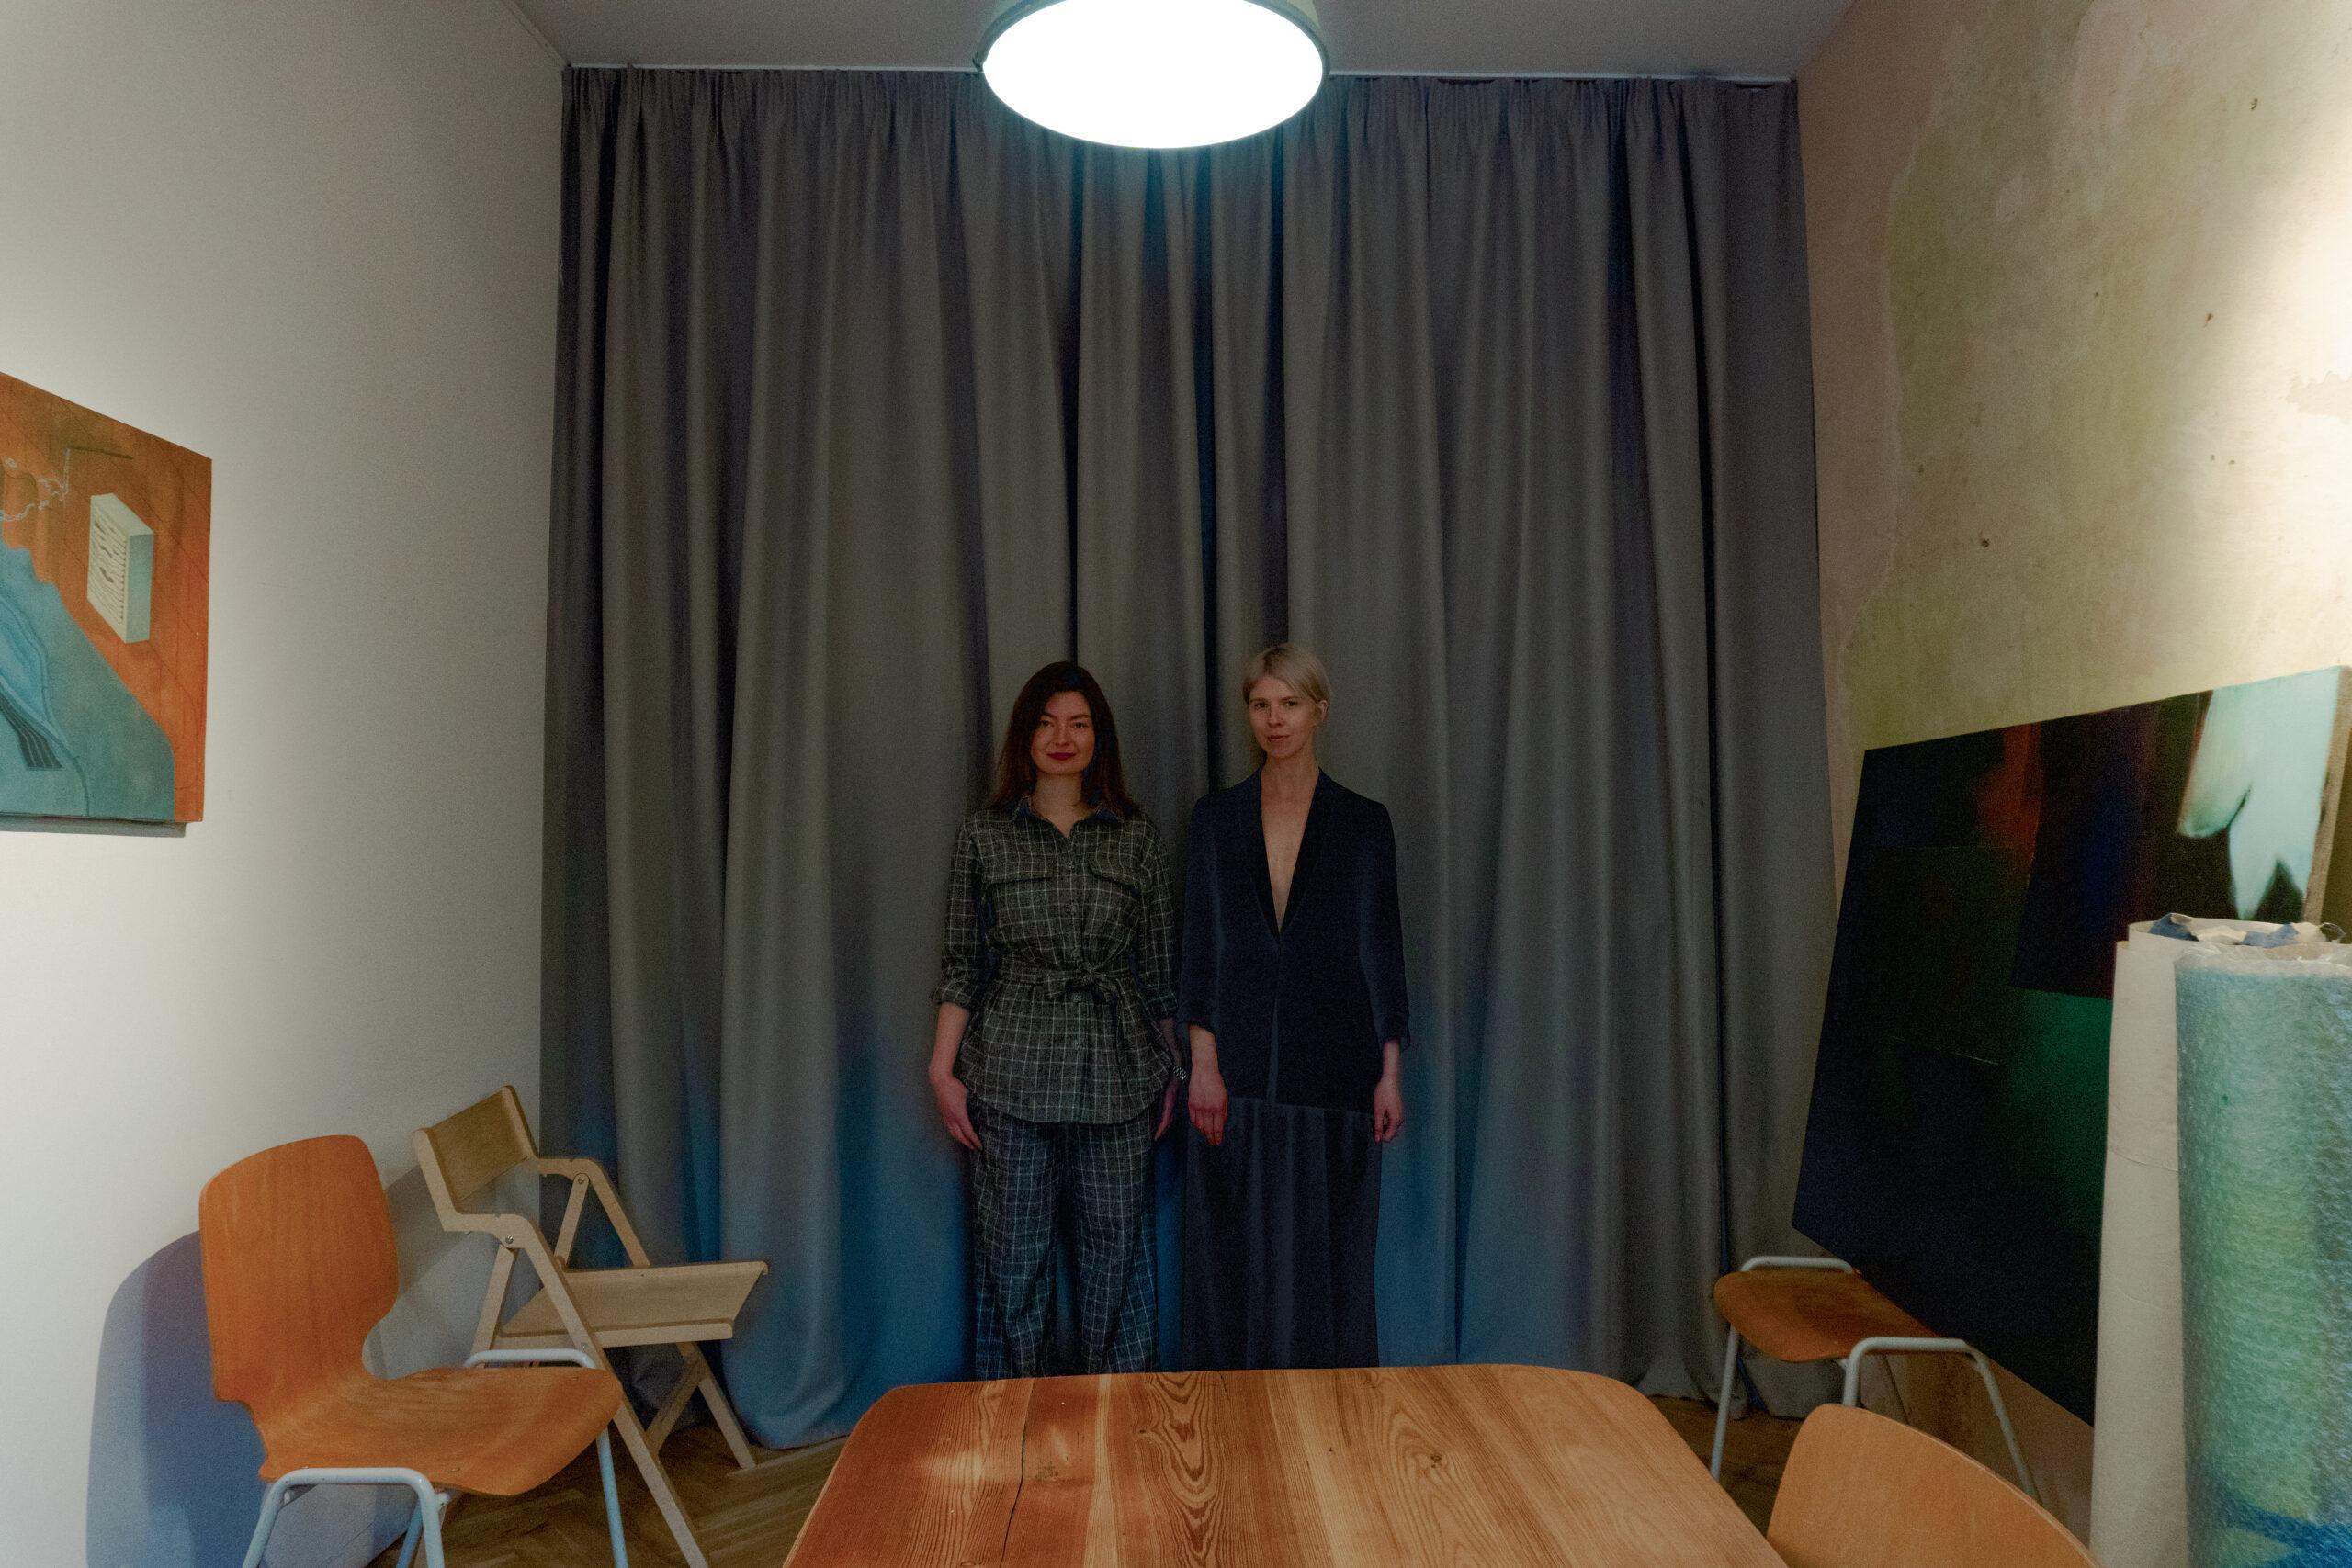 Лізавета Герман та Марія Ланько в галереї The Naked Room